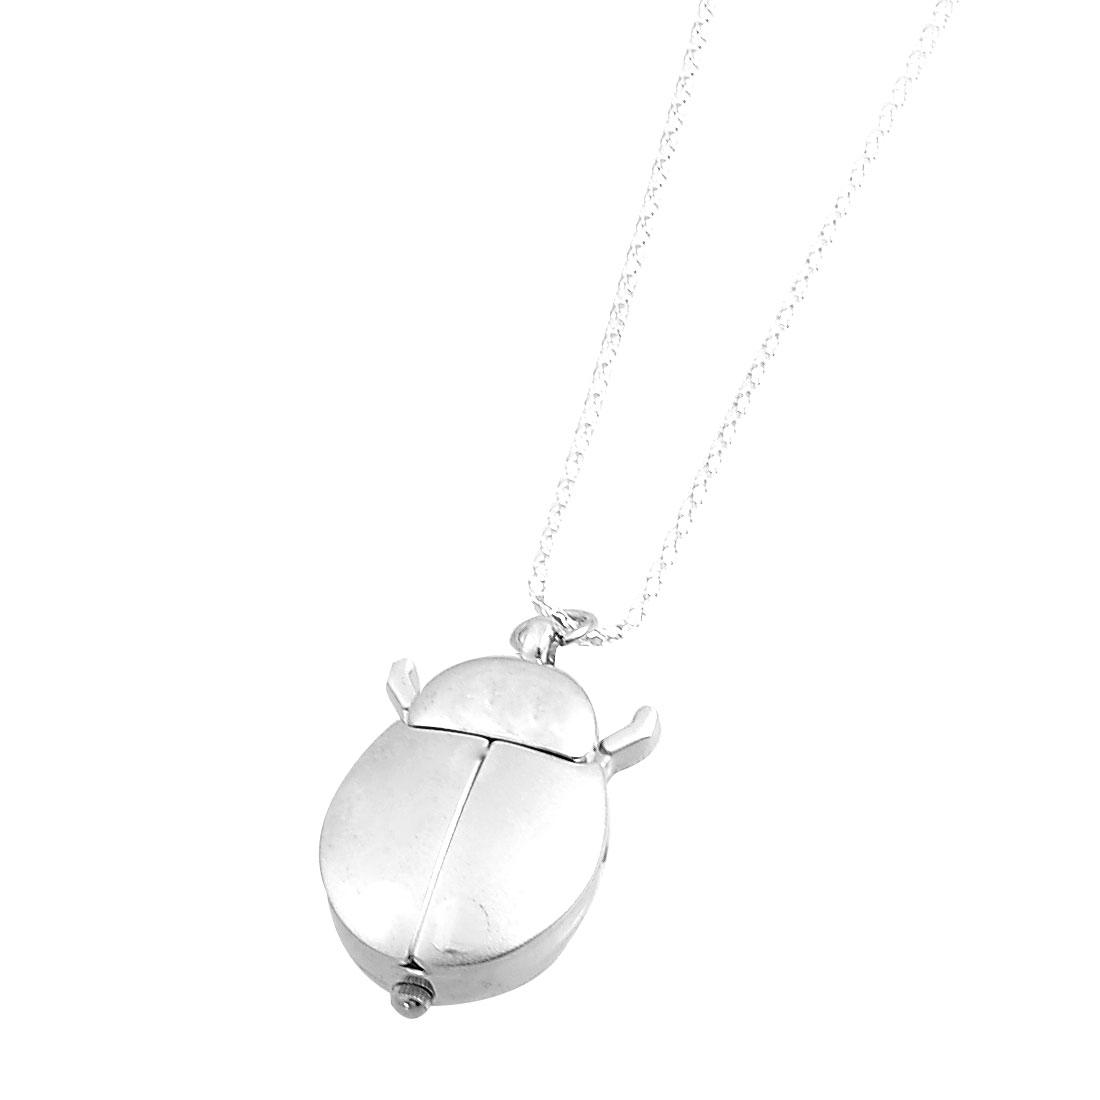 Ladies Silver Tone Metal Ladybug Pendant Necklace Quartz Watch